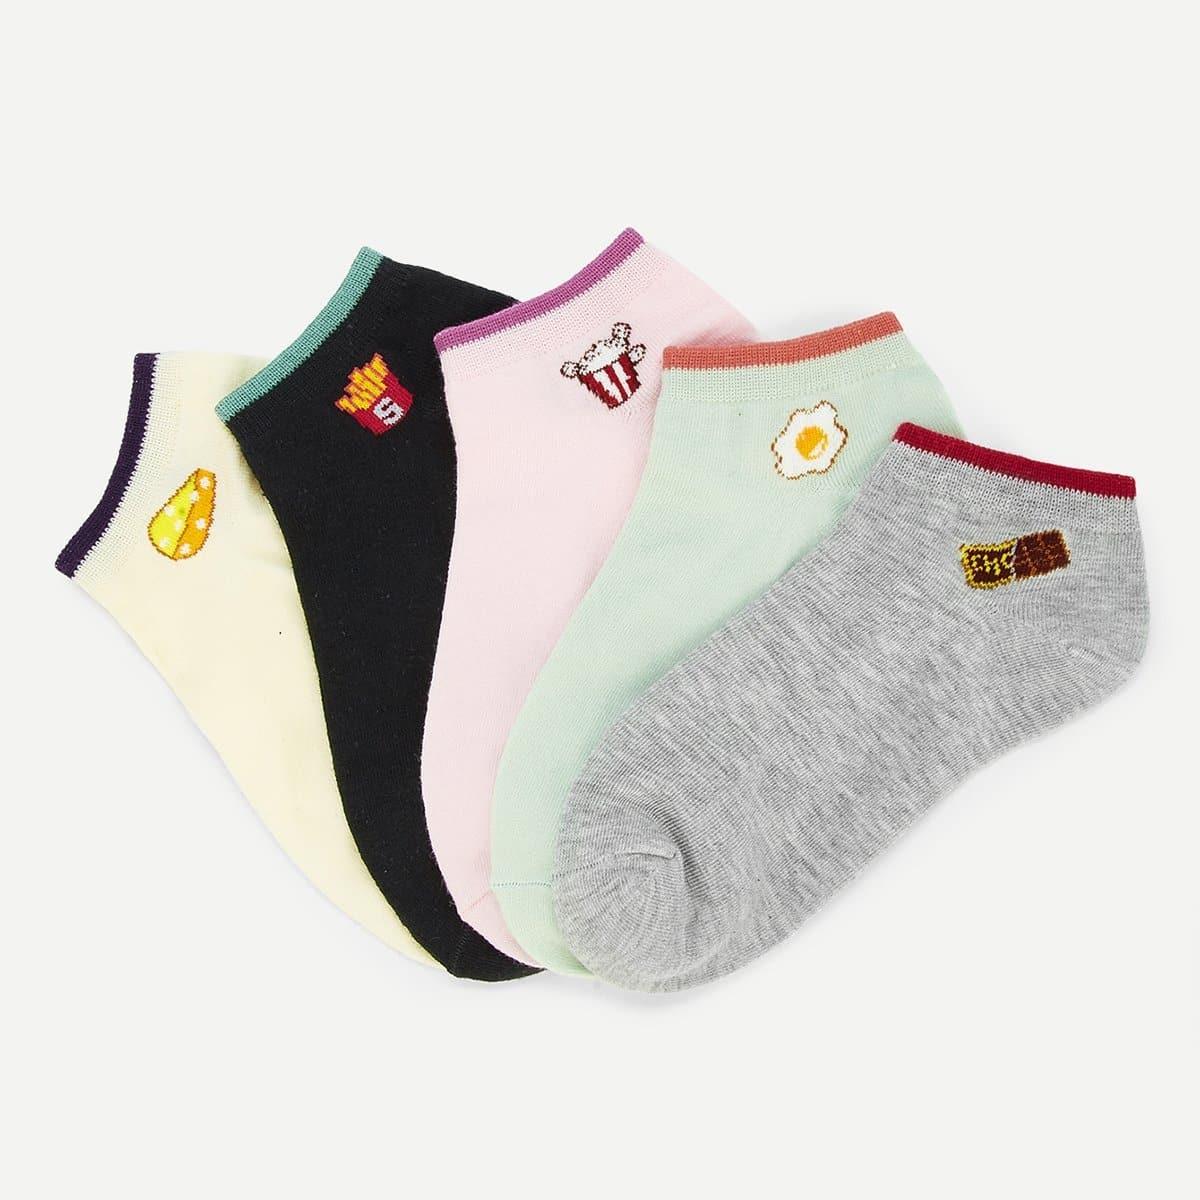 Contrast Cuff Below Ankle Socks 5 Pairs